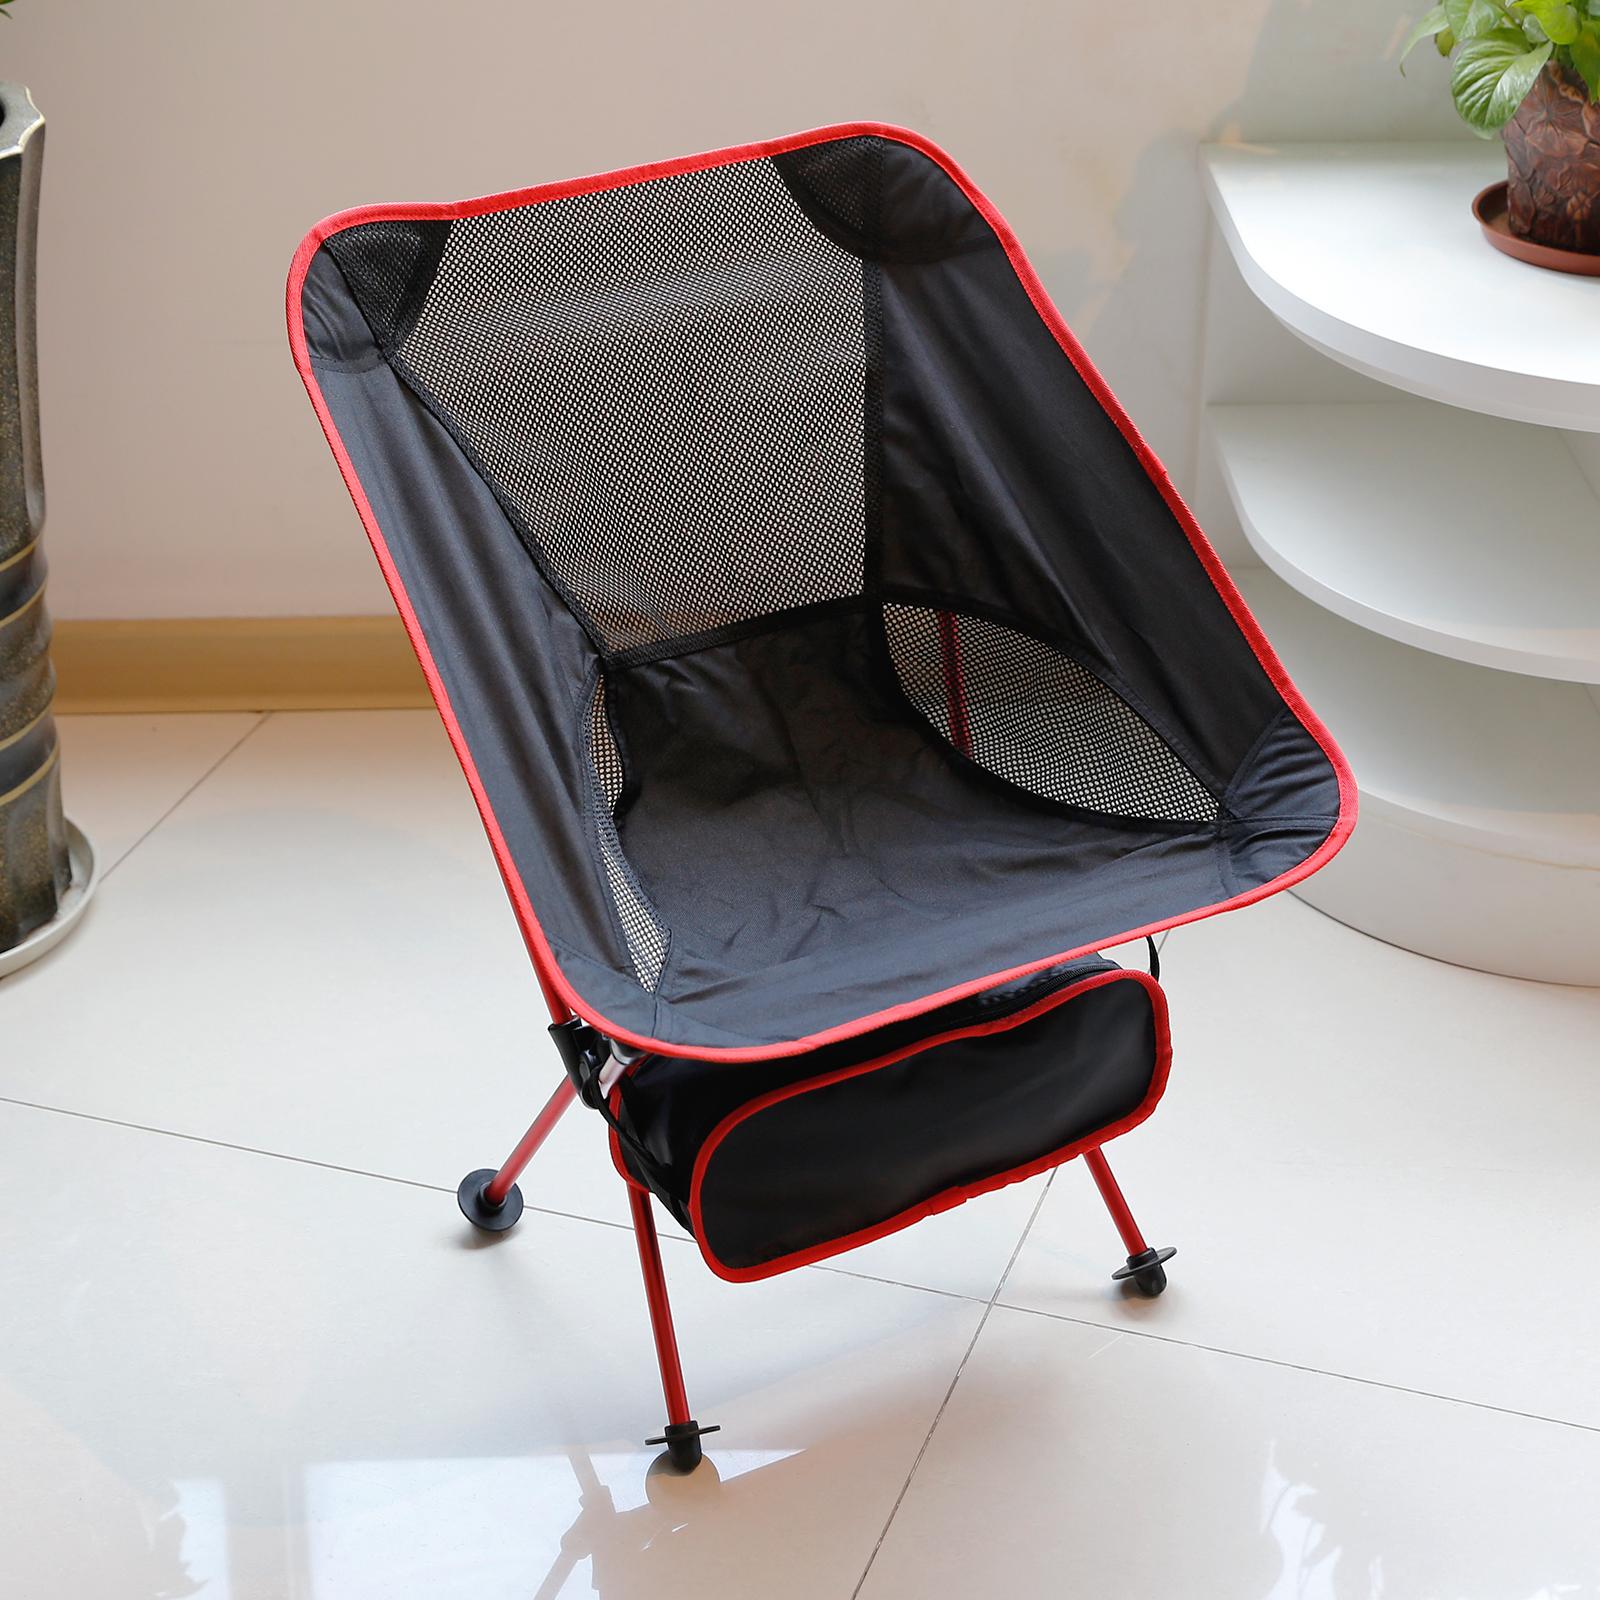 Chaise pliable fold l ger camp bbq outdoor si ge pad p che plage jardin bureau ebay - Siege de plage ultra leger ...